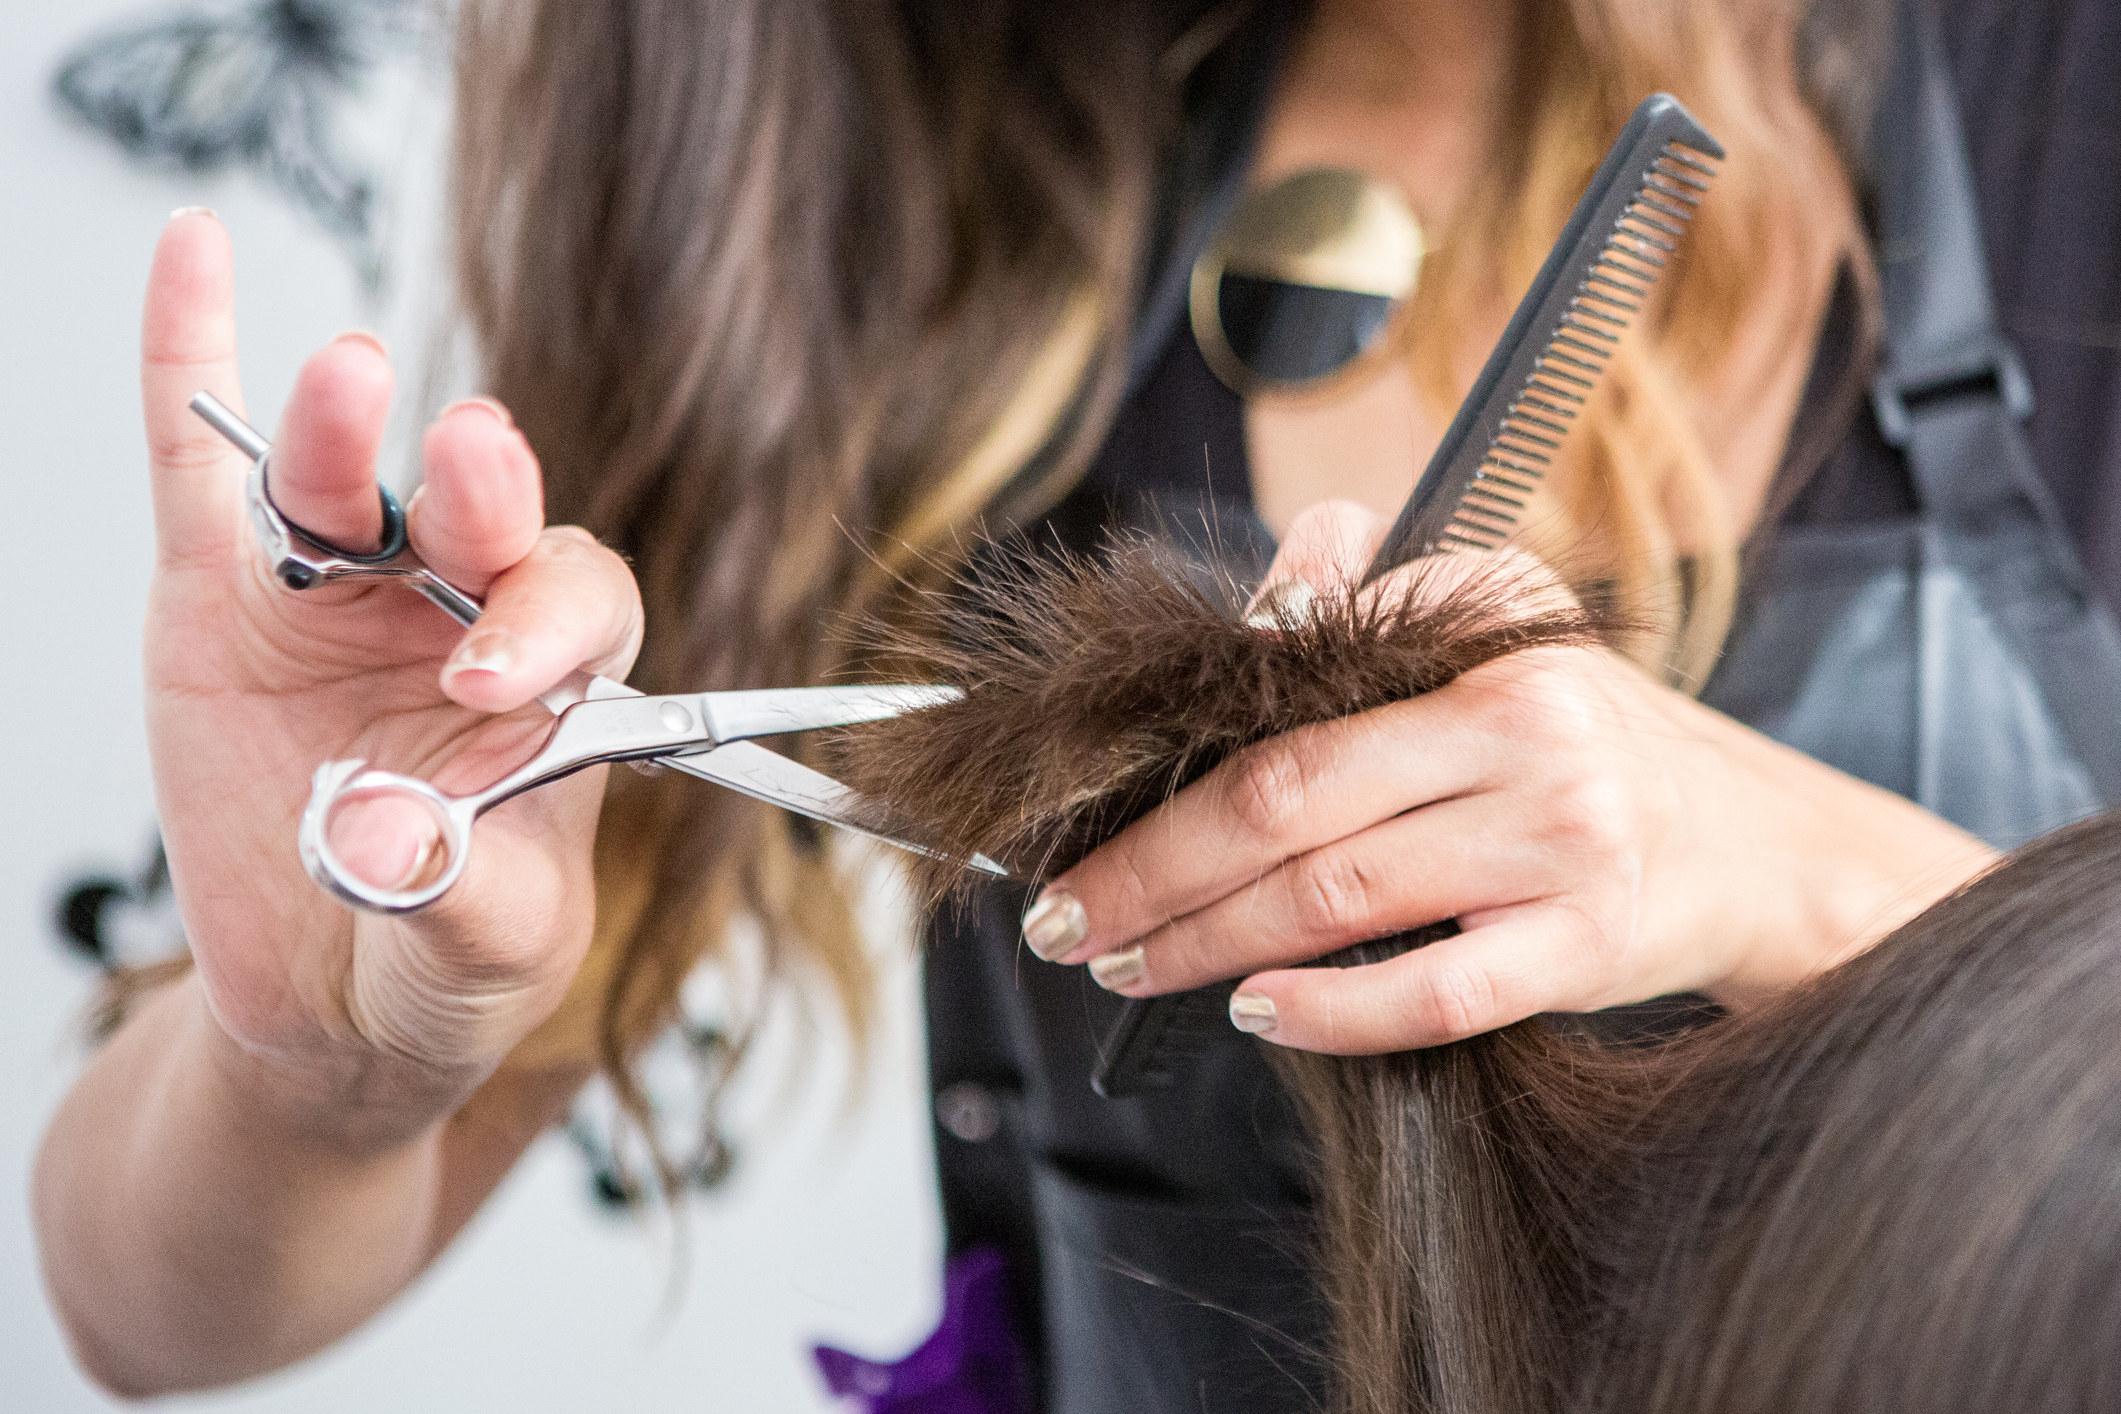 A hairdresser cuts a client's hair